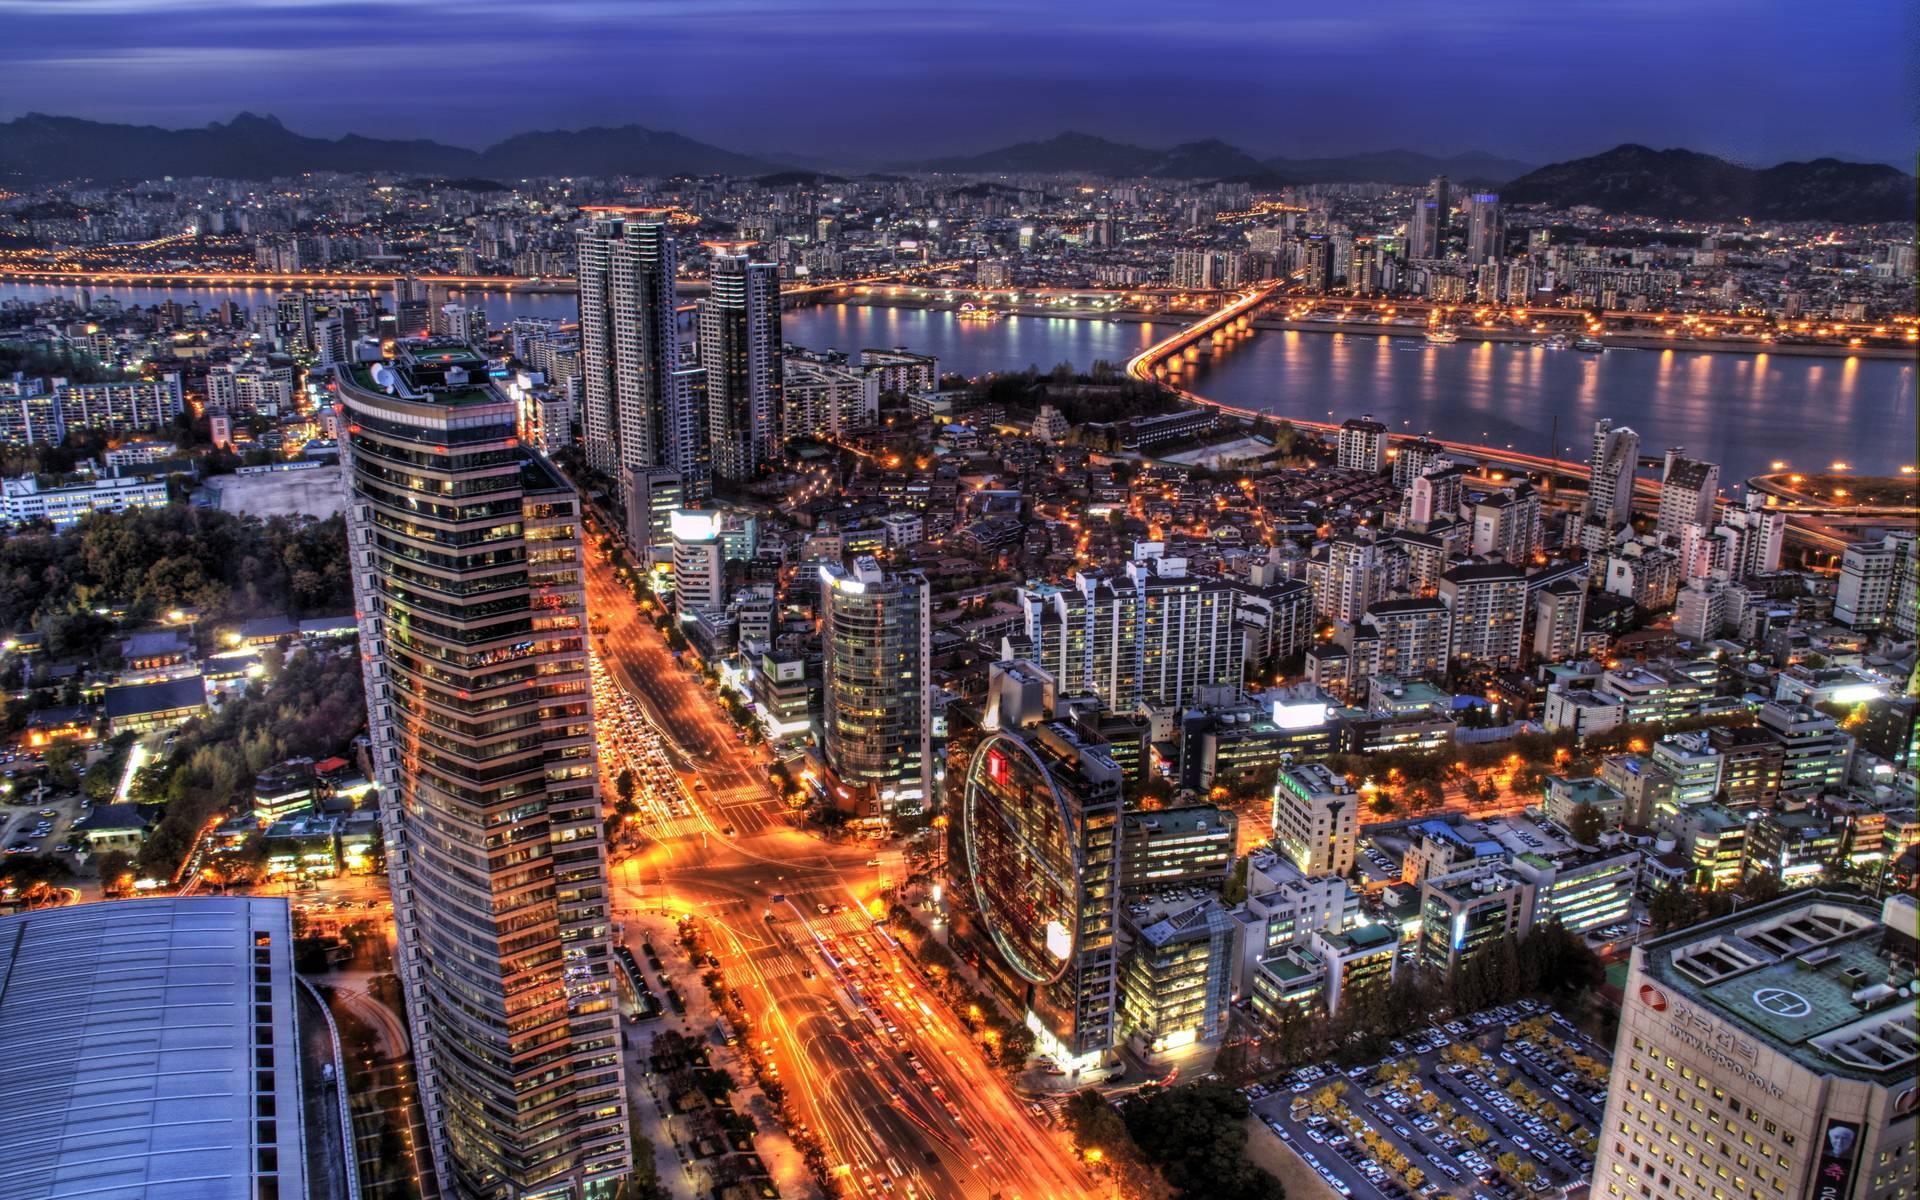 Seoul-night-seoul-37135614-1920-1200